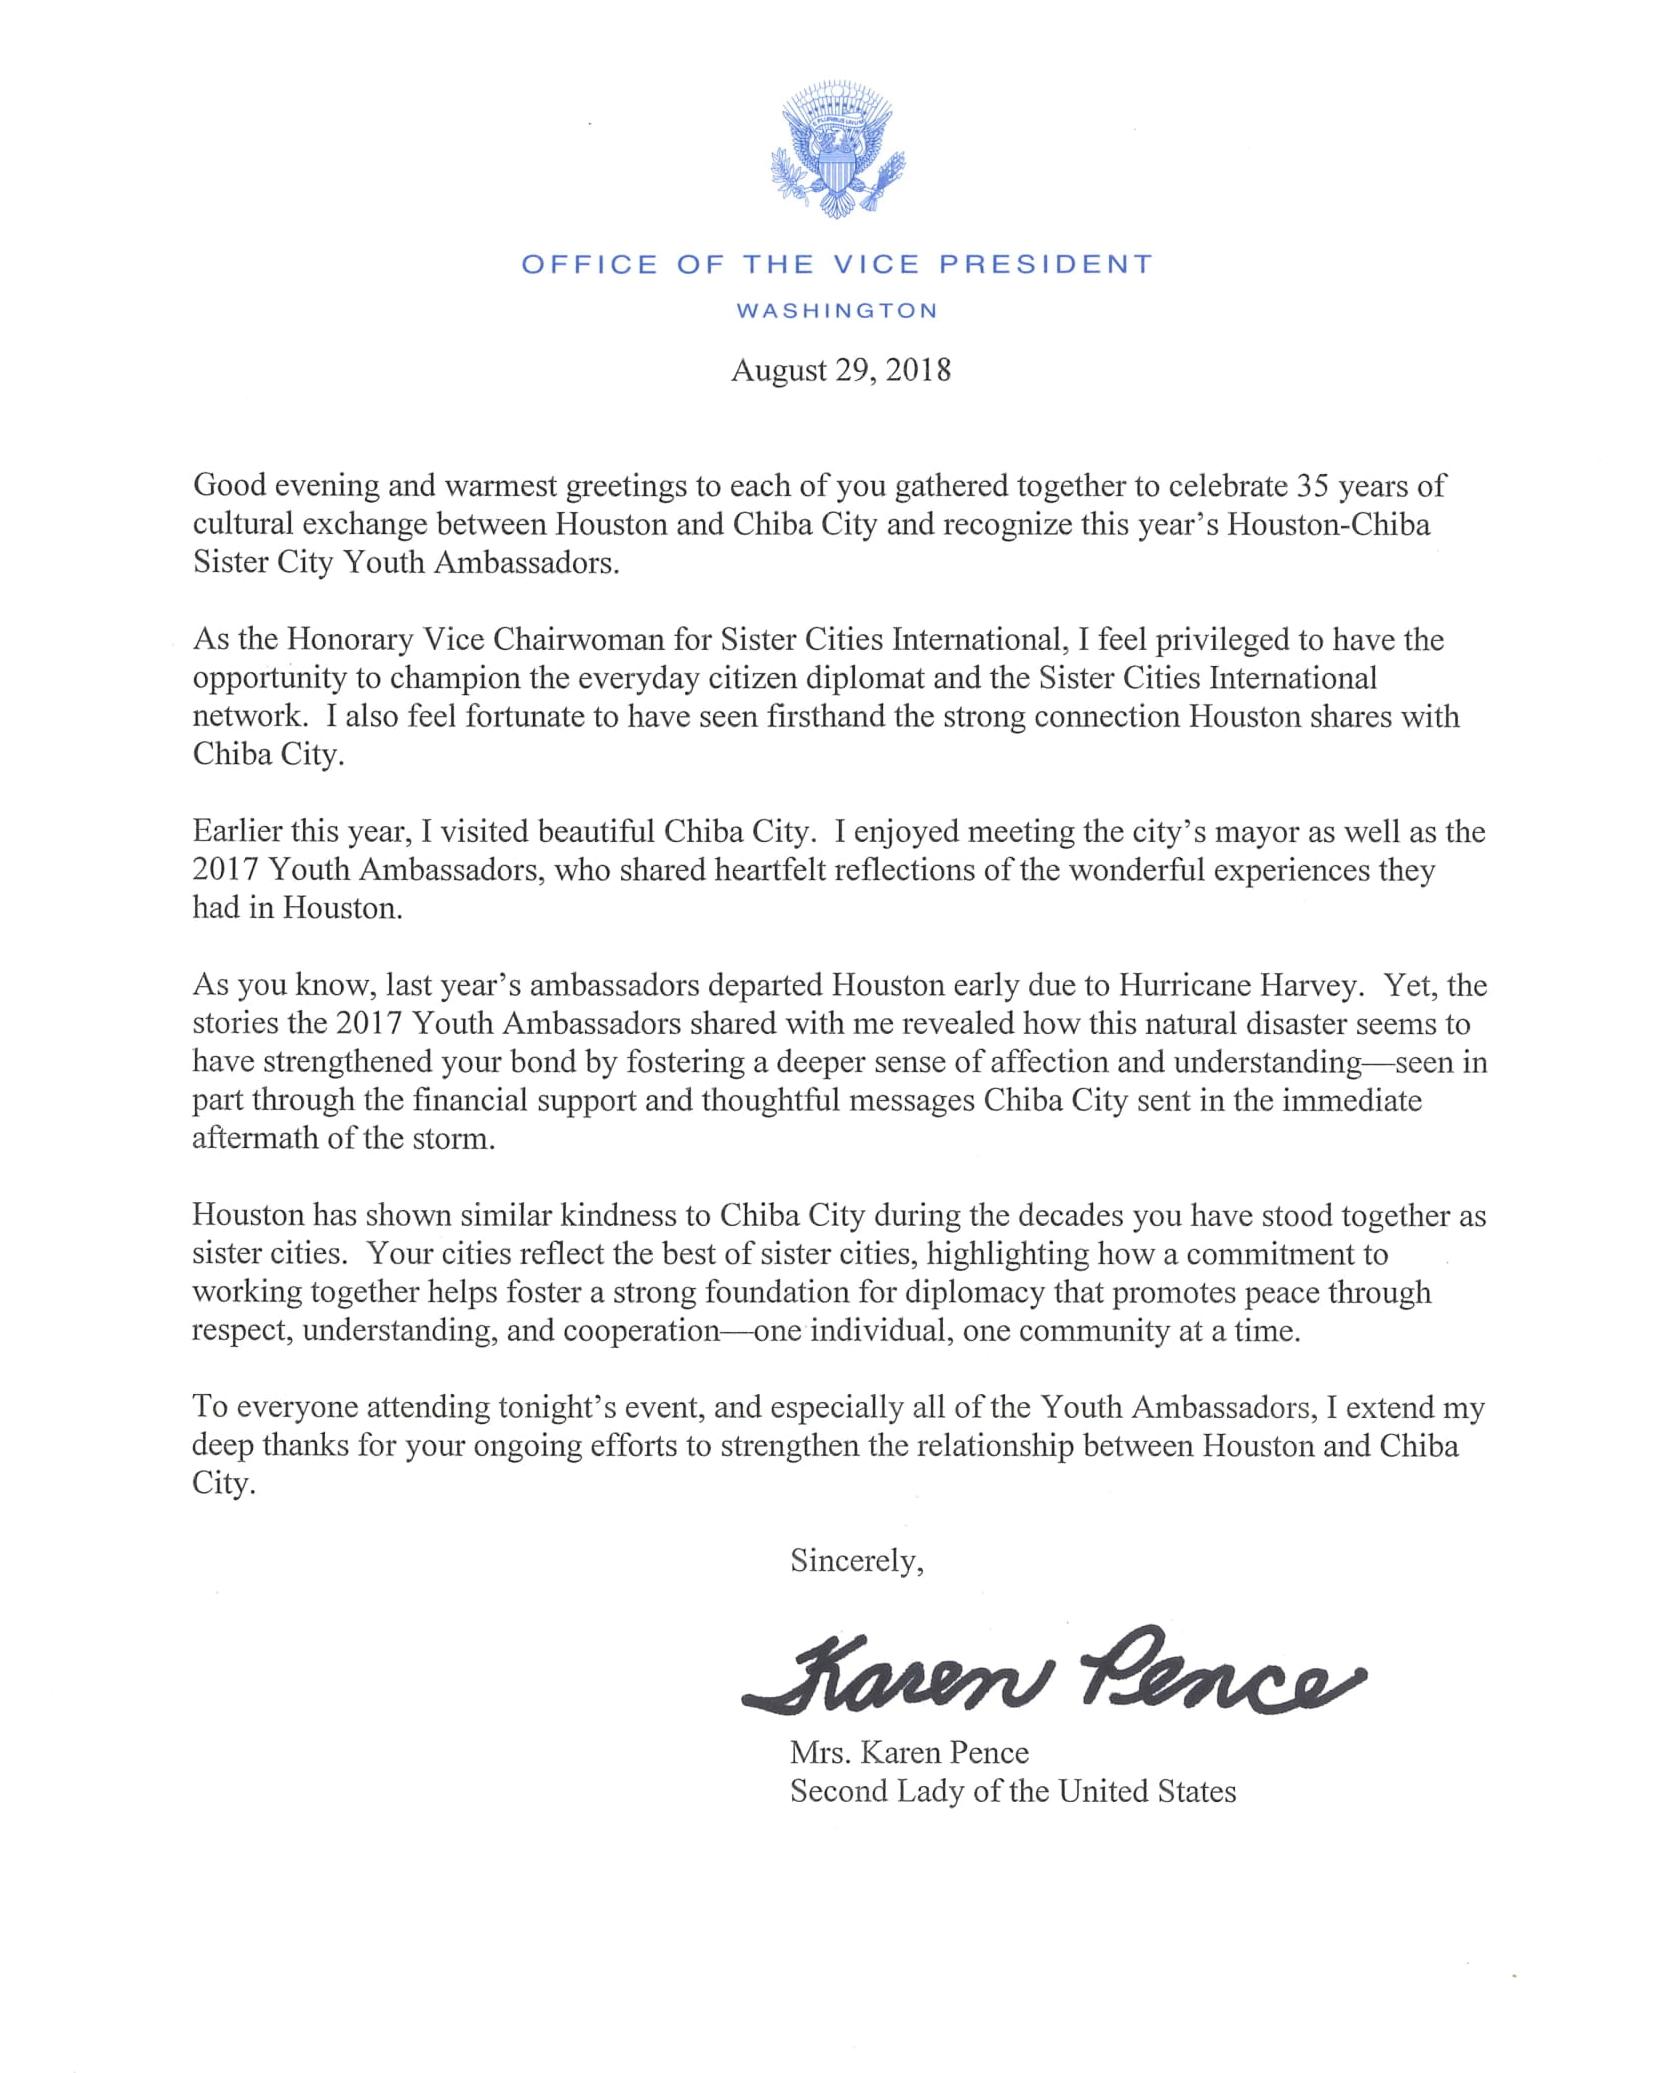 SLOTUS Greetings Letter to 2018 Houston-Chiba Sister City Youth Ambassad...-1.jpg